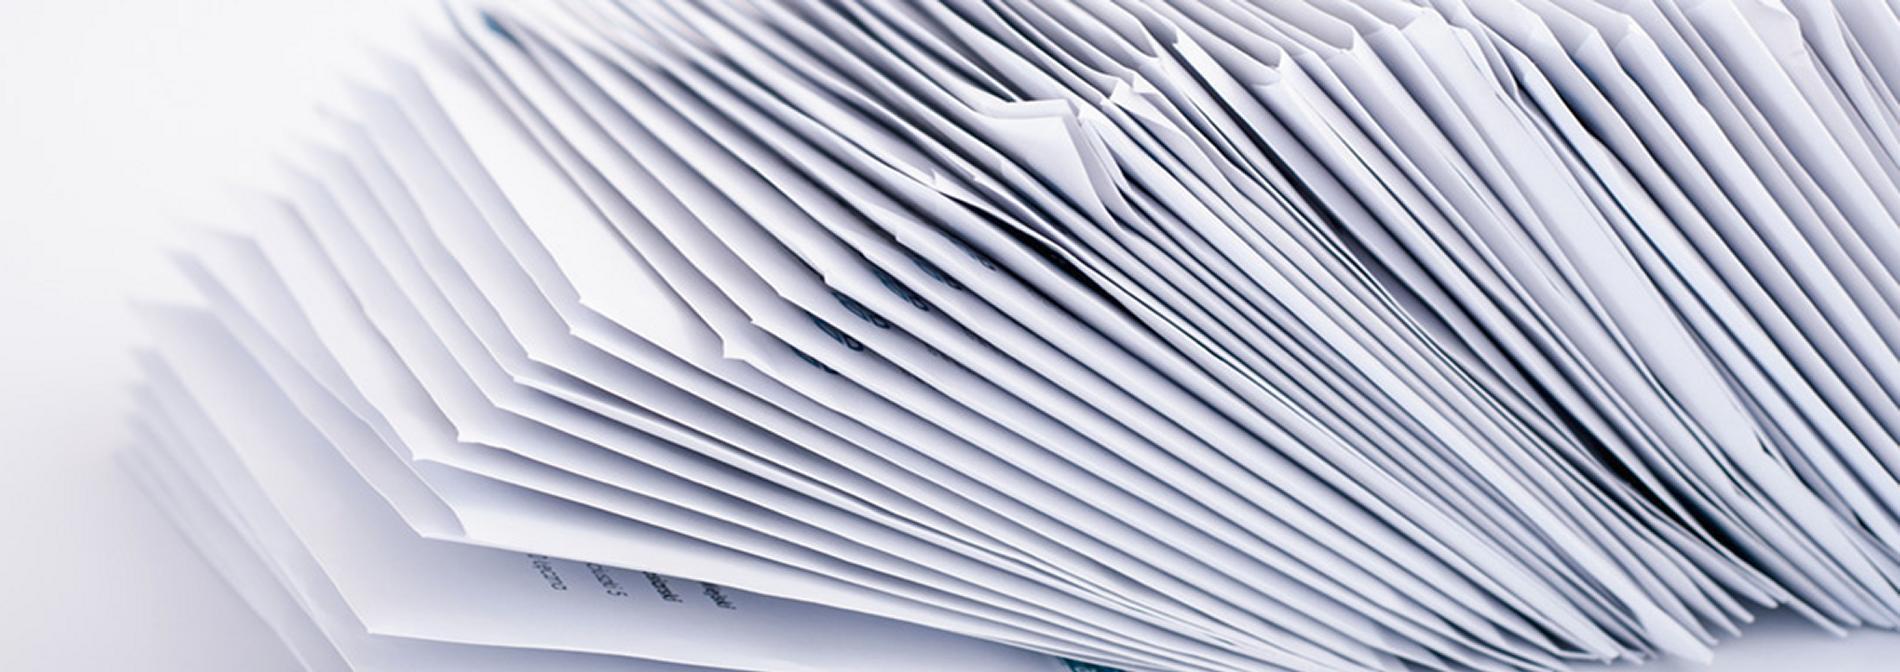 imprimeur-routage-distribution-yvelines-78